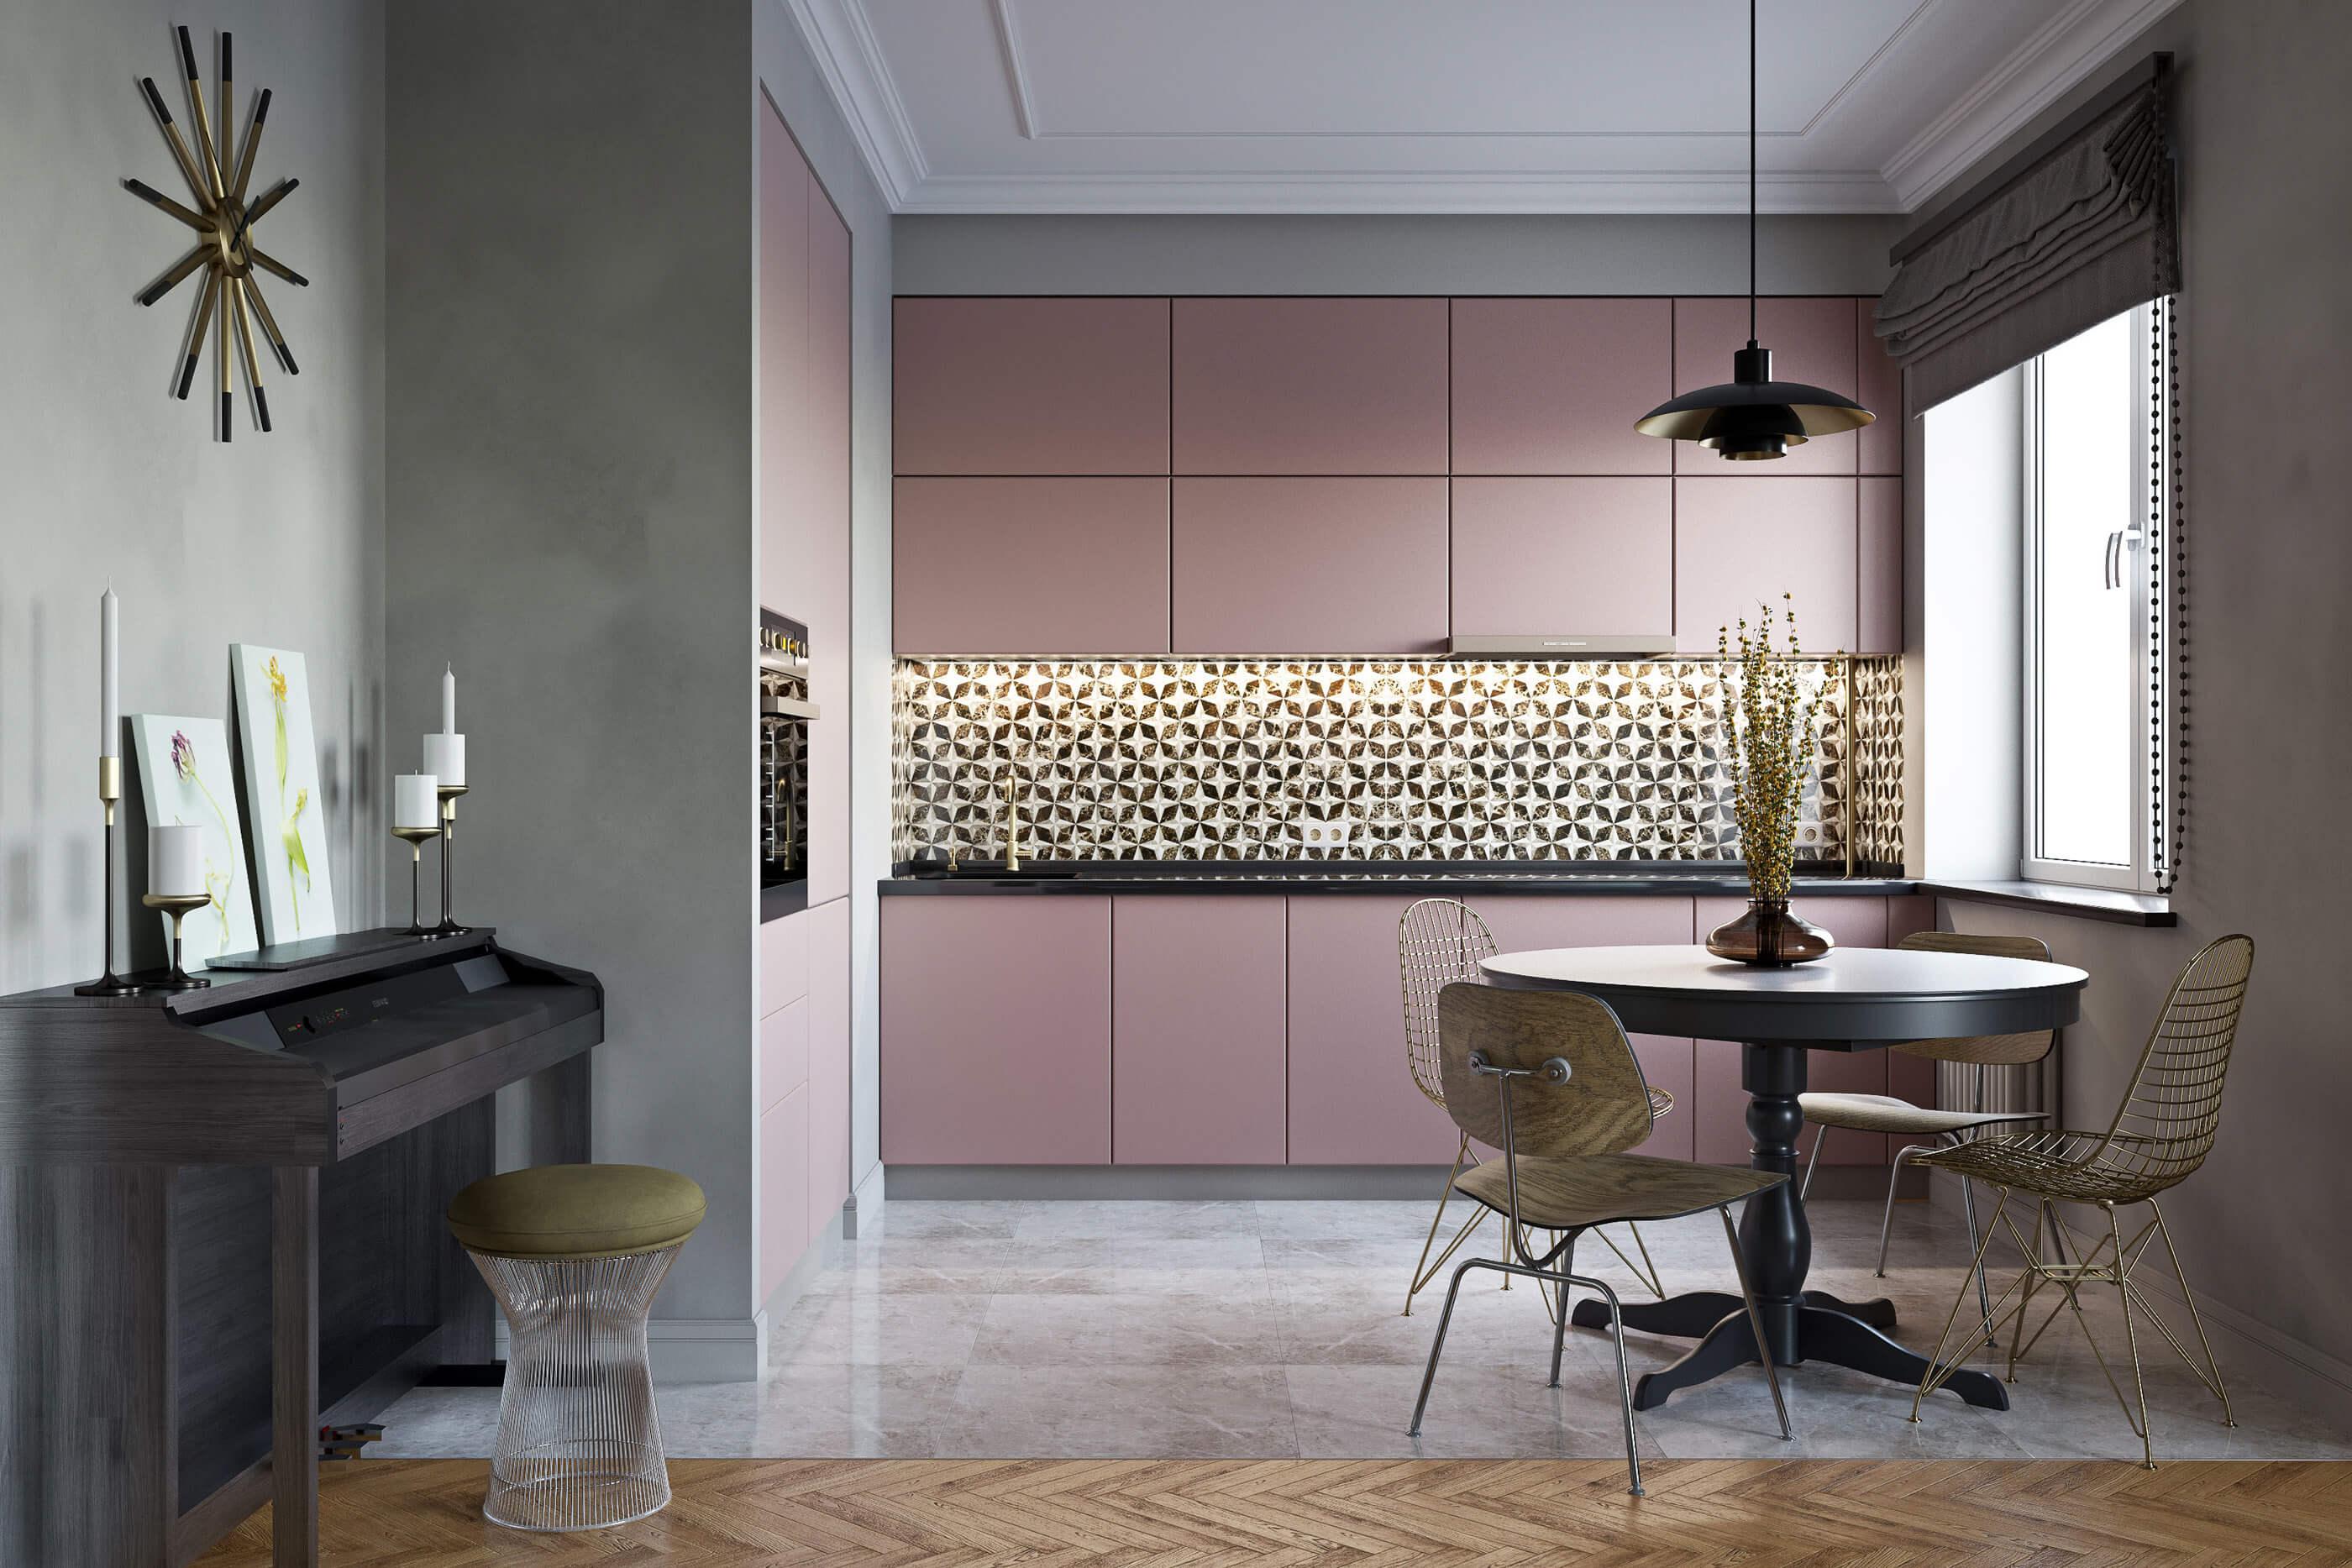 mẫu tủ bếp màu pastel